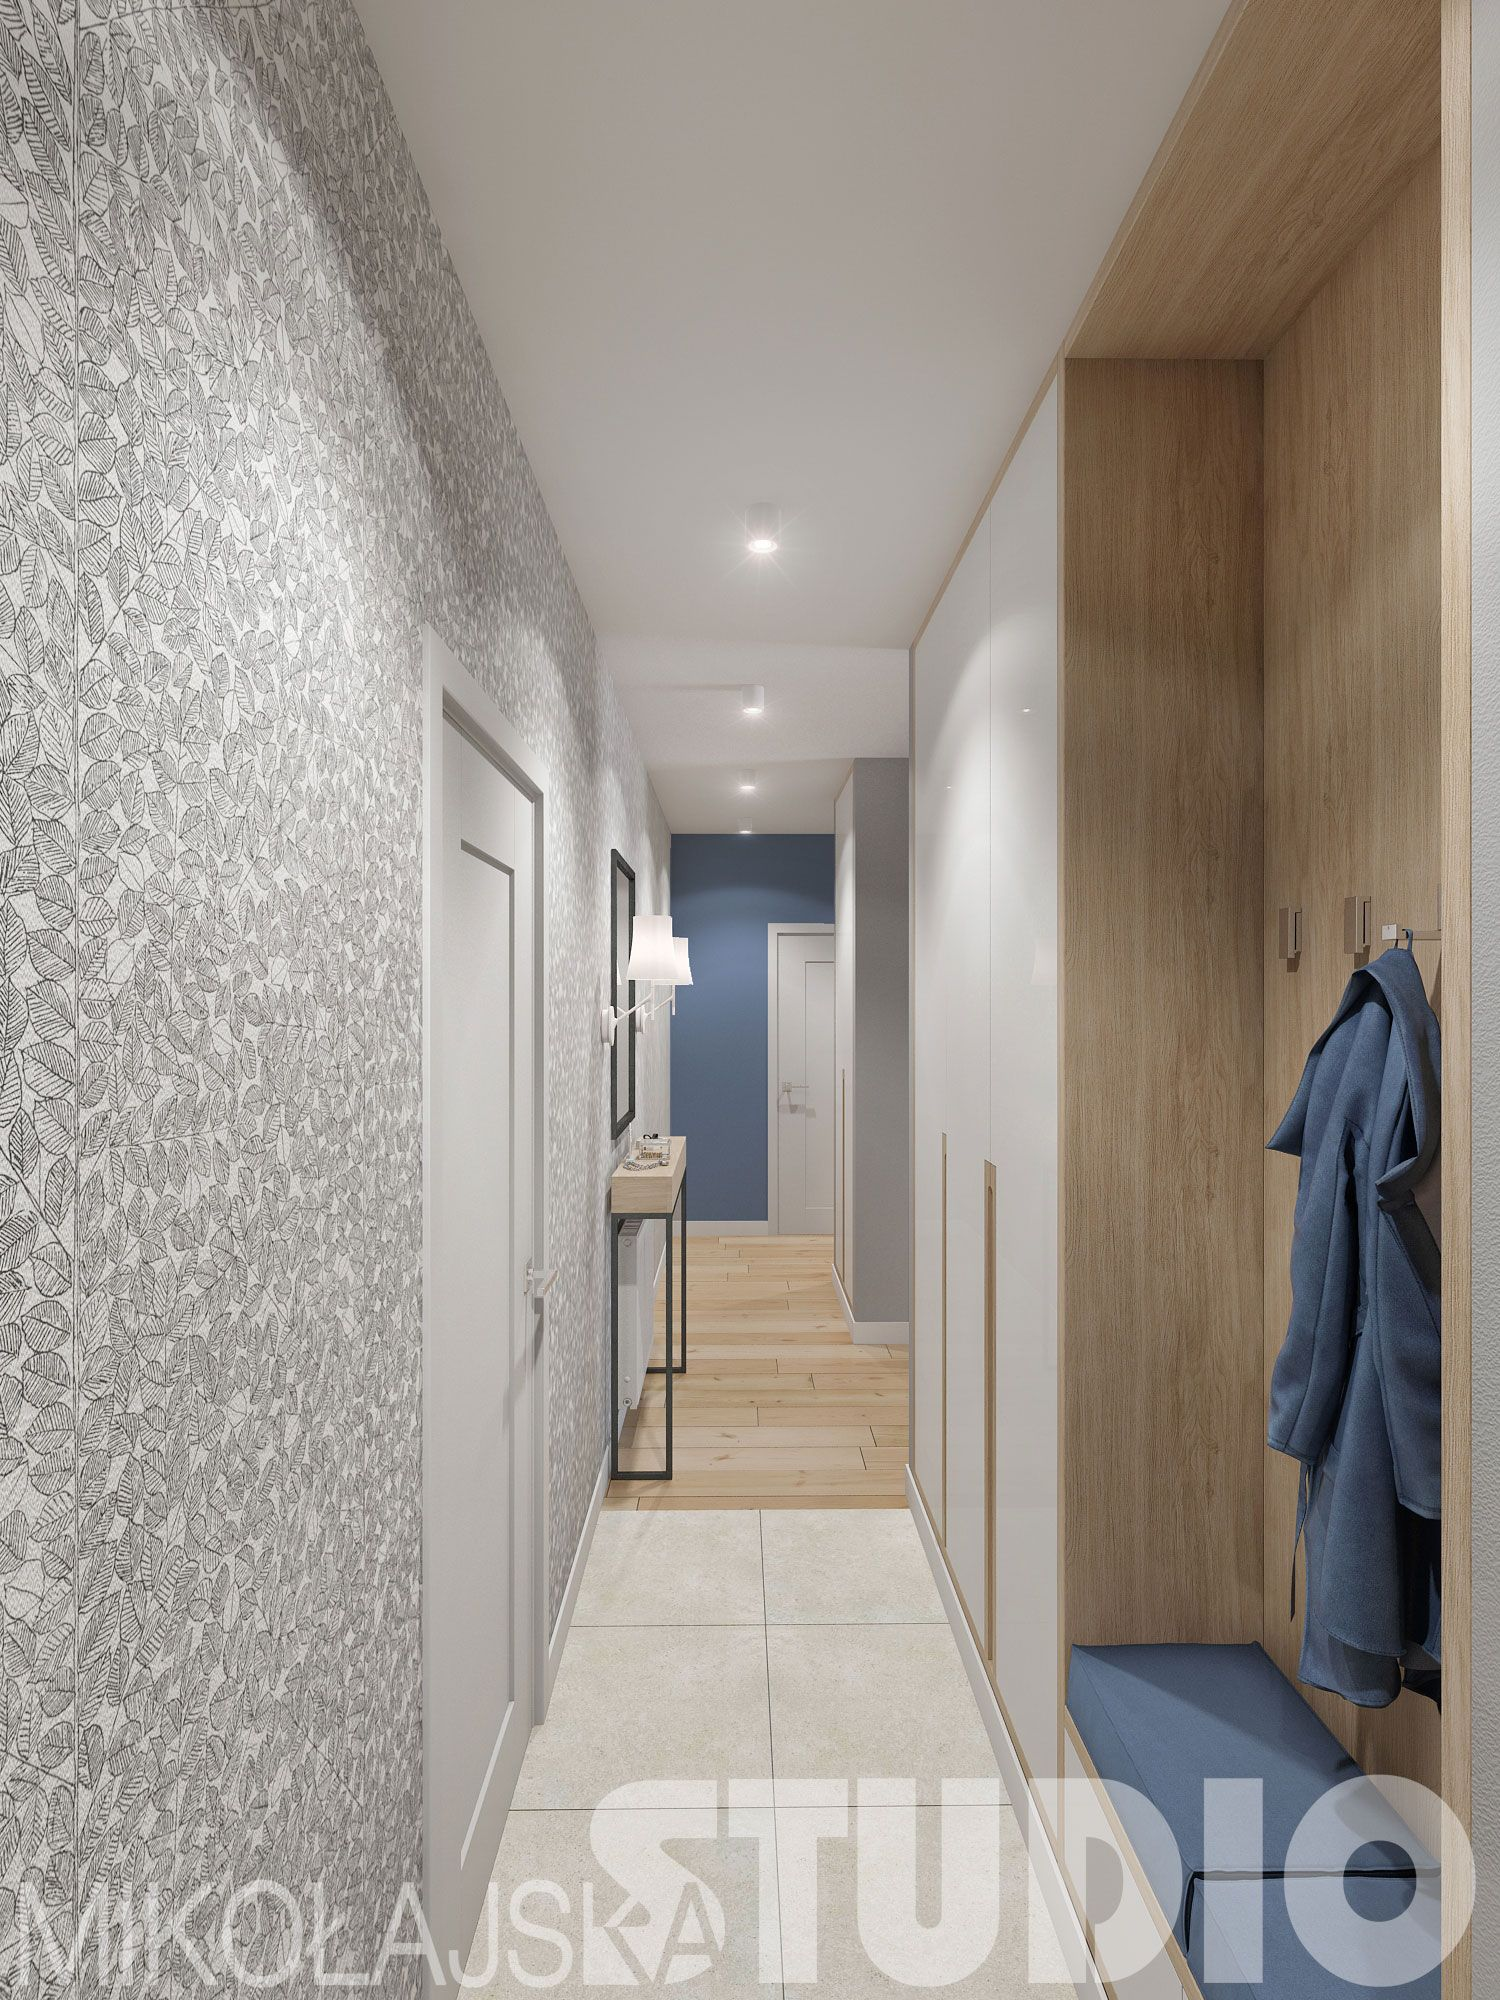 Jasny Korytarz Home Sweet Home Flooring